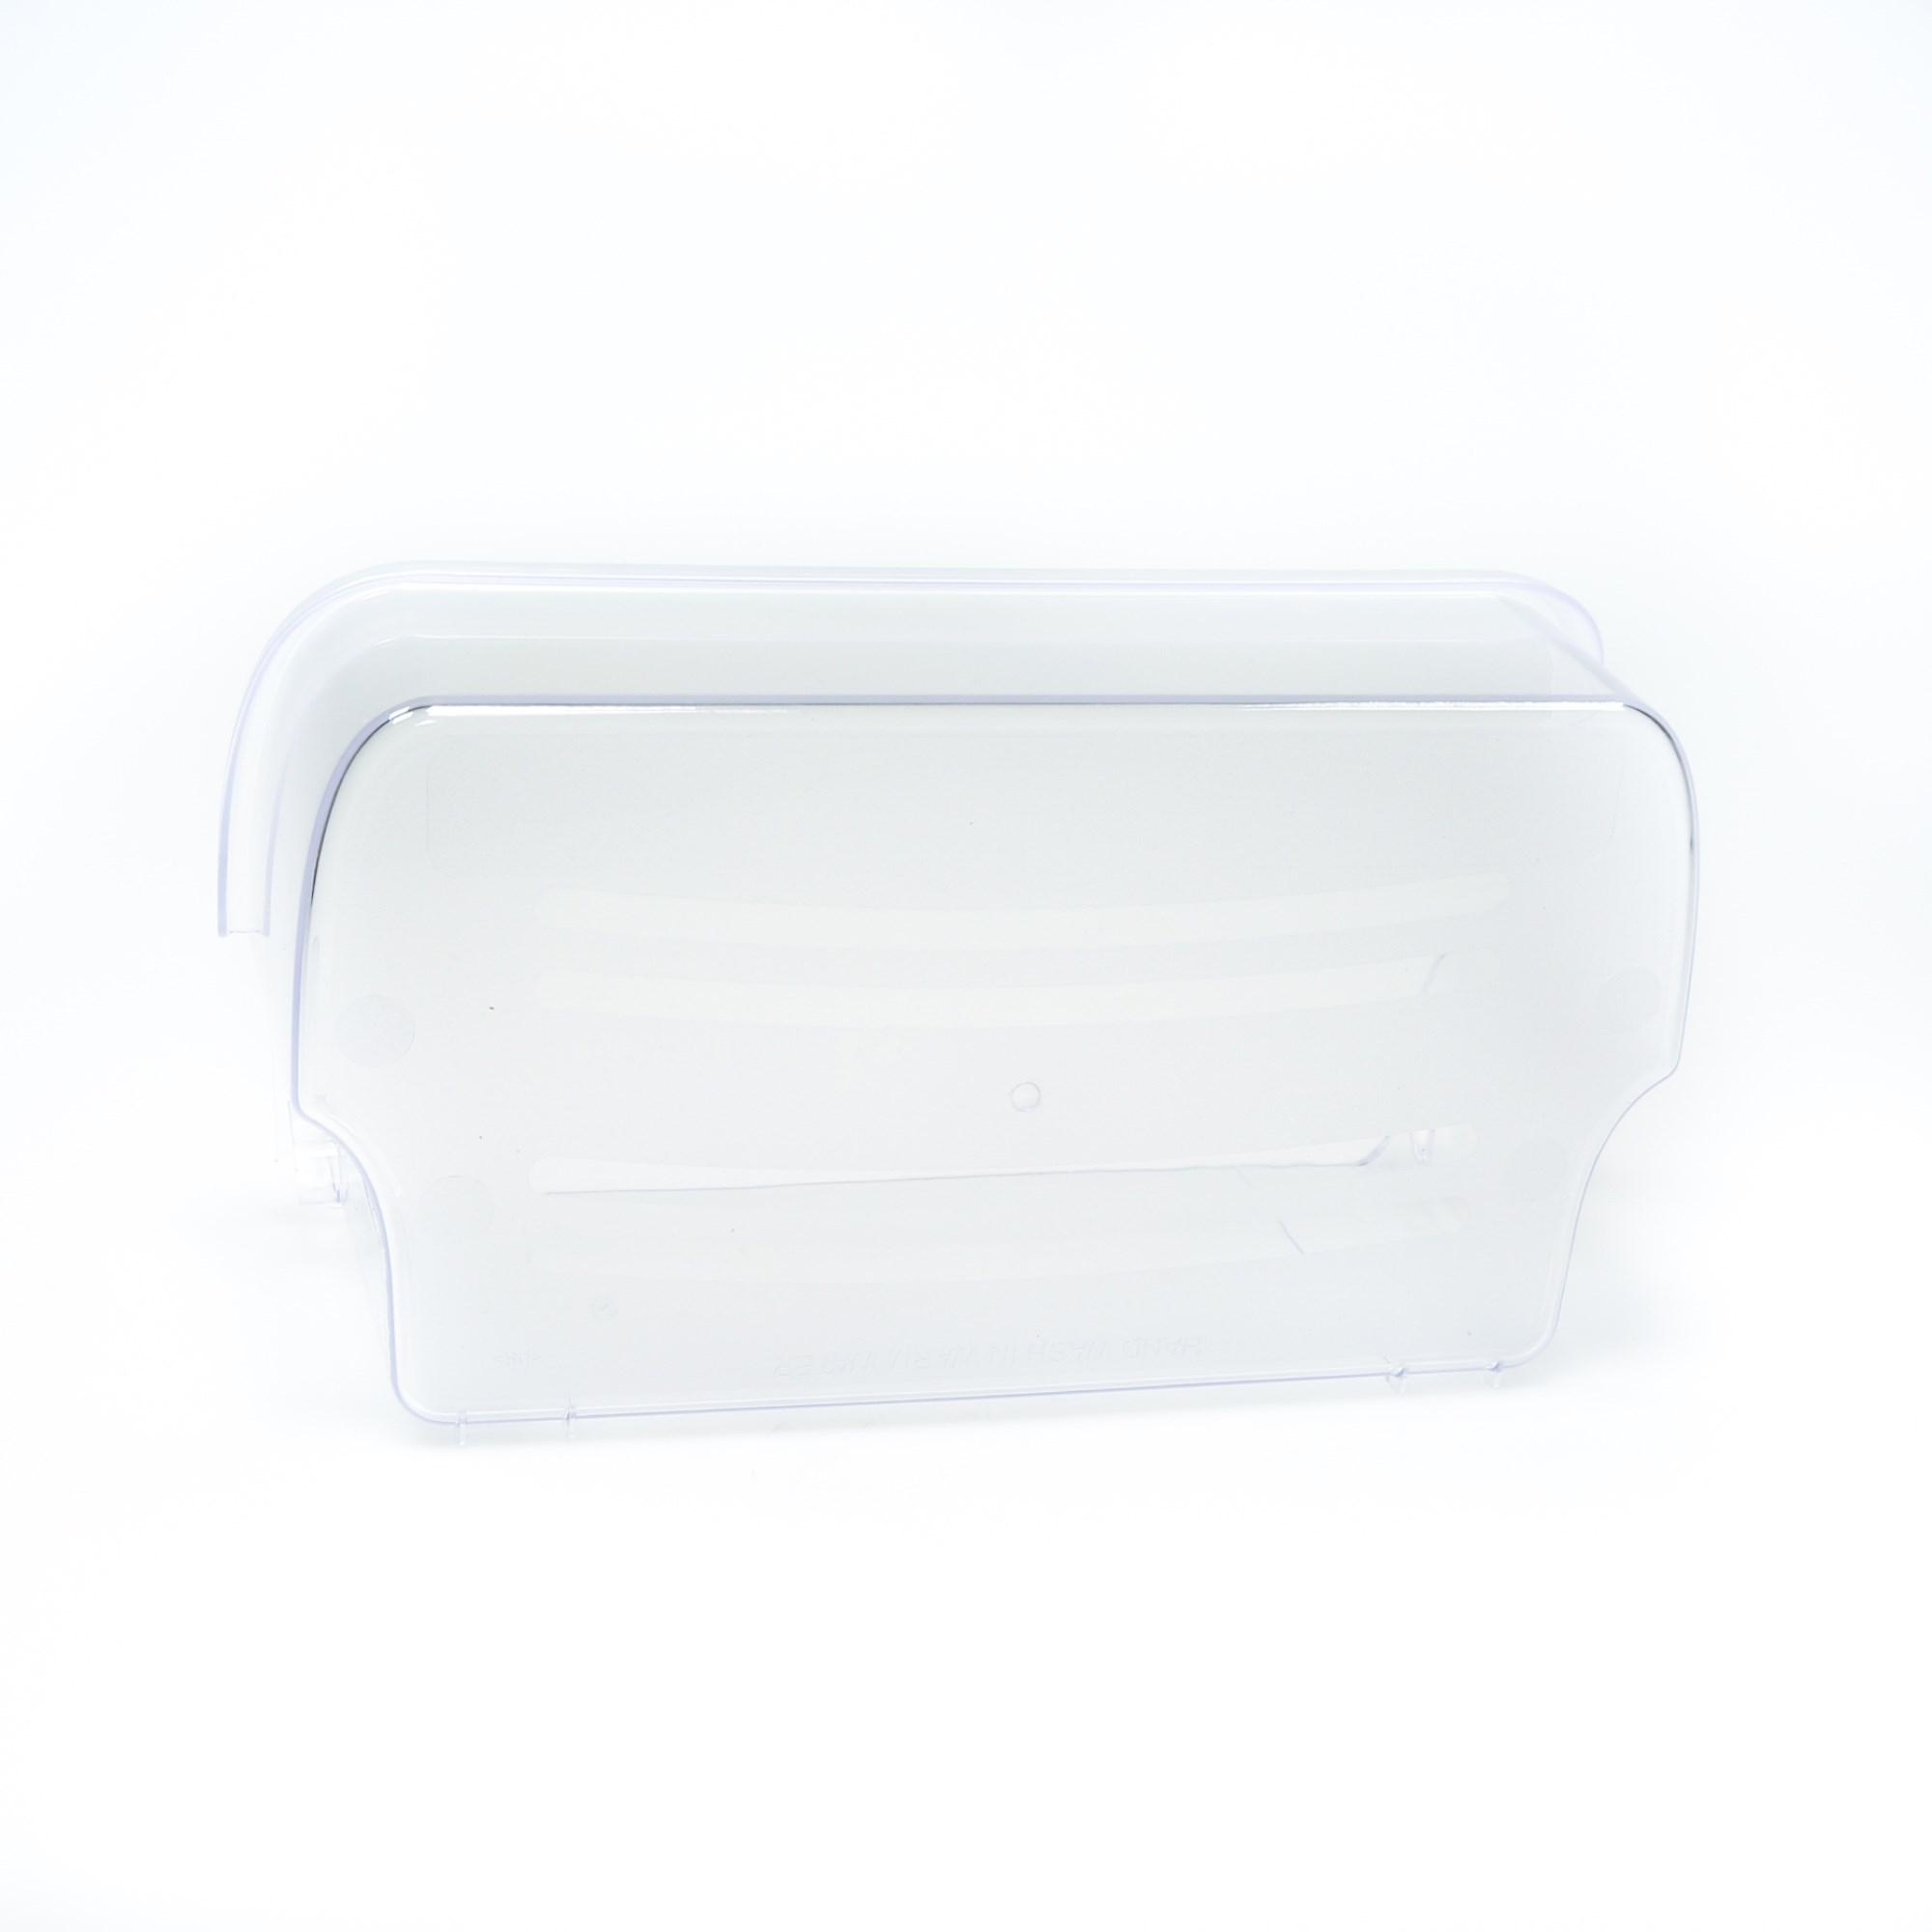 Door Bin Compatible Frigidaire LFSS2312TF0 FPHS2386LF3 FFSS2315TP0 FRS23KF6EME